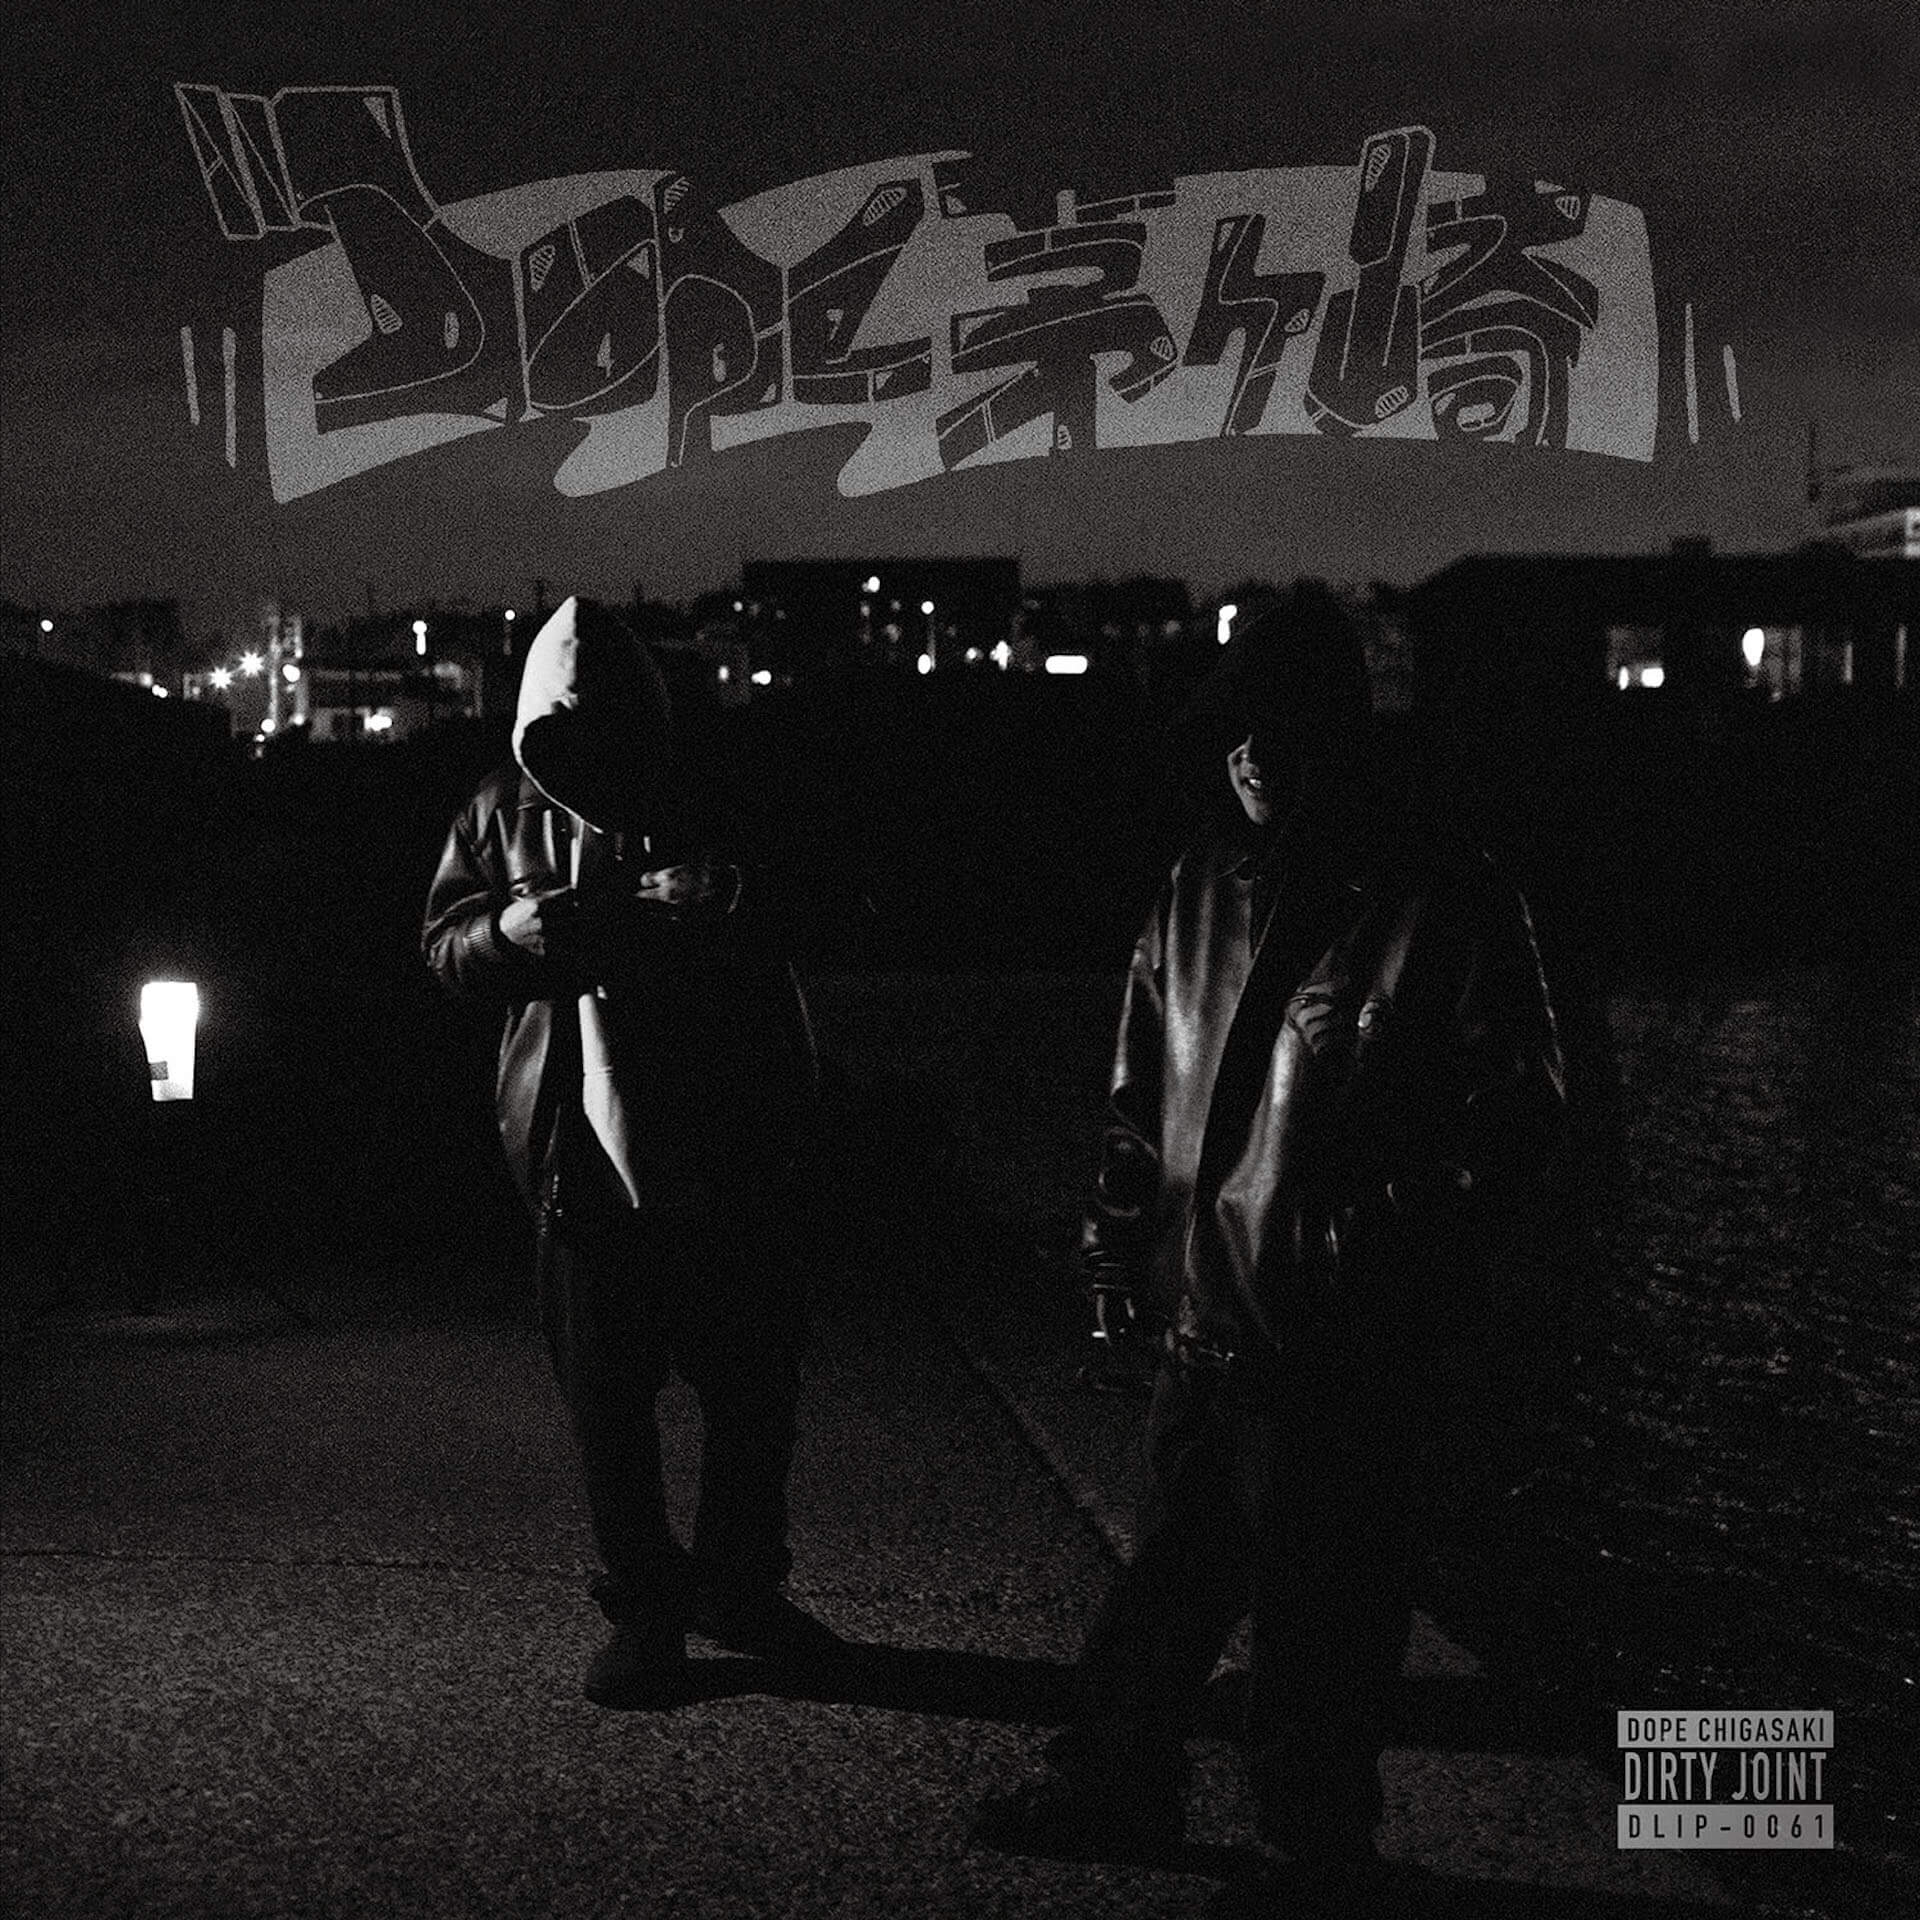 〈DLiP RECORDS〉主催イベント<BLAQLIST>でもおなじみのDIRTY JOINTが『DOPE CHIGASAKI』をリリース決定! music200825_dirtyjoint_2